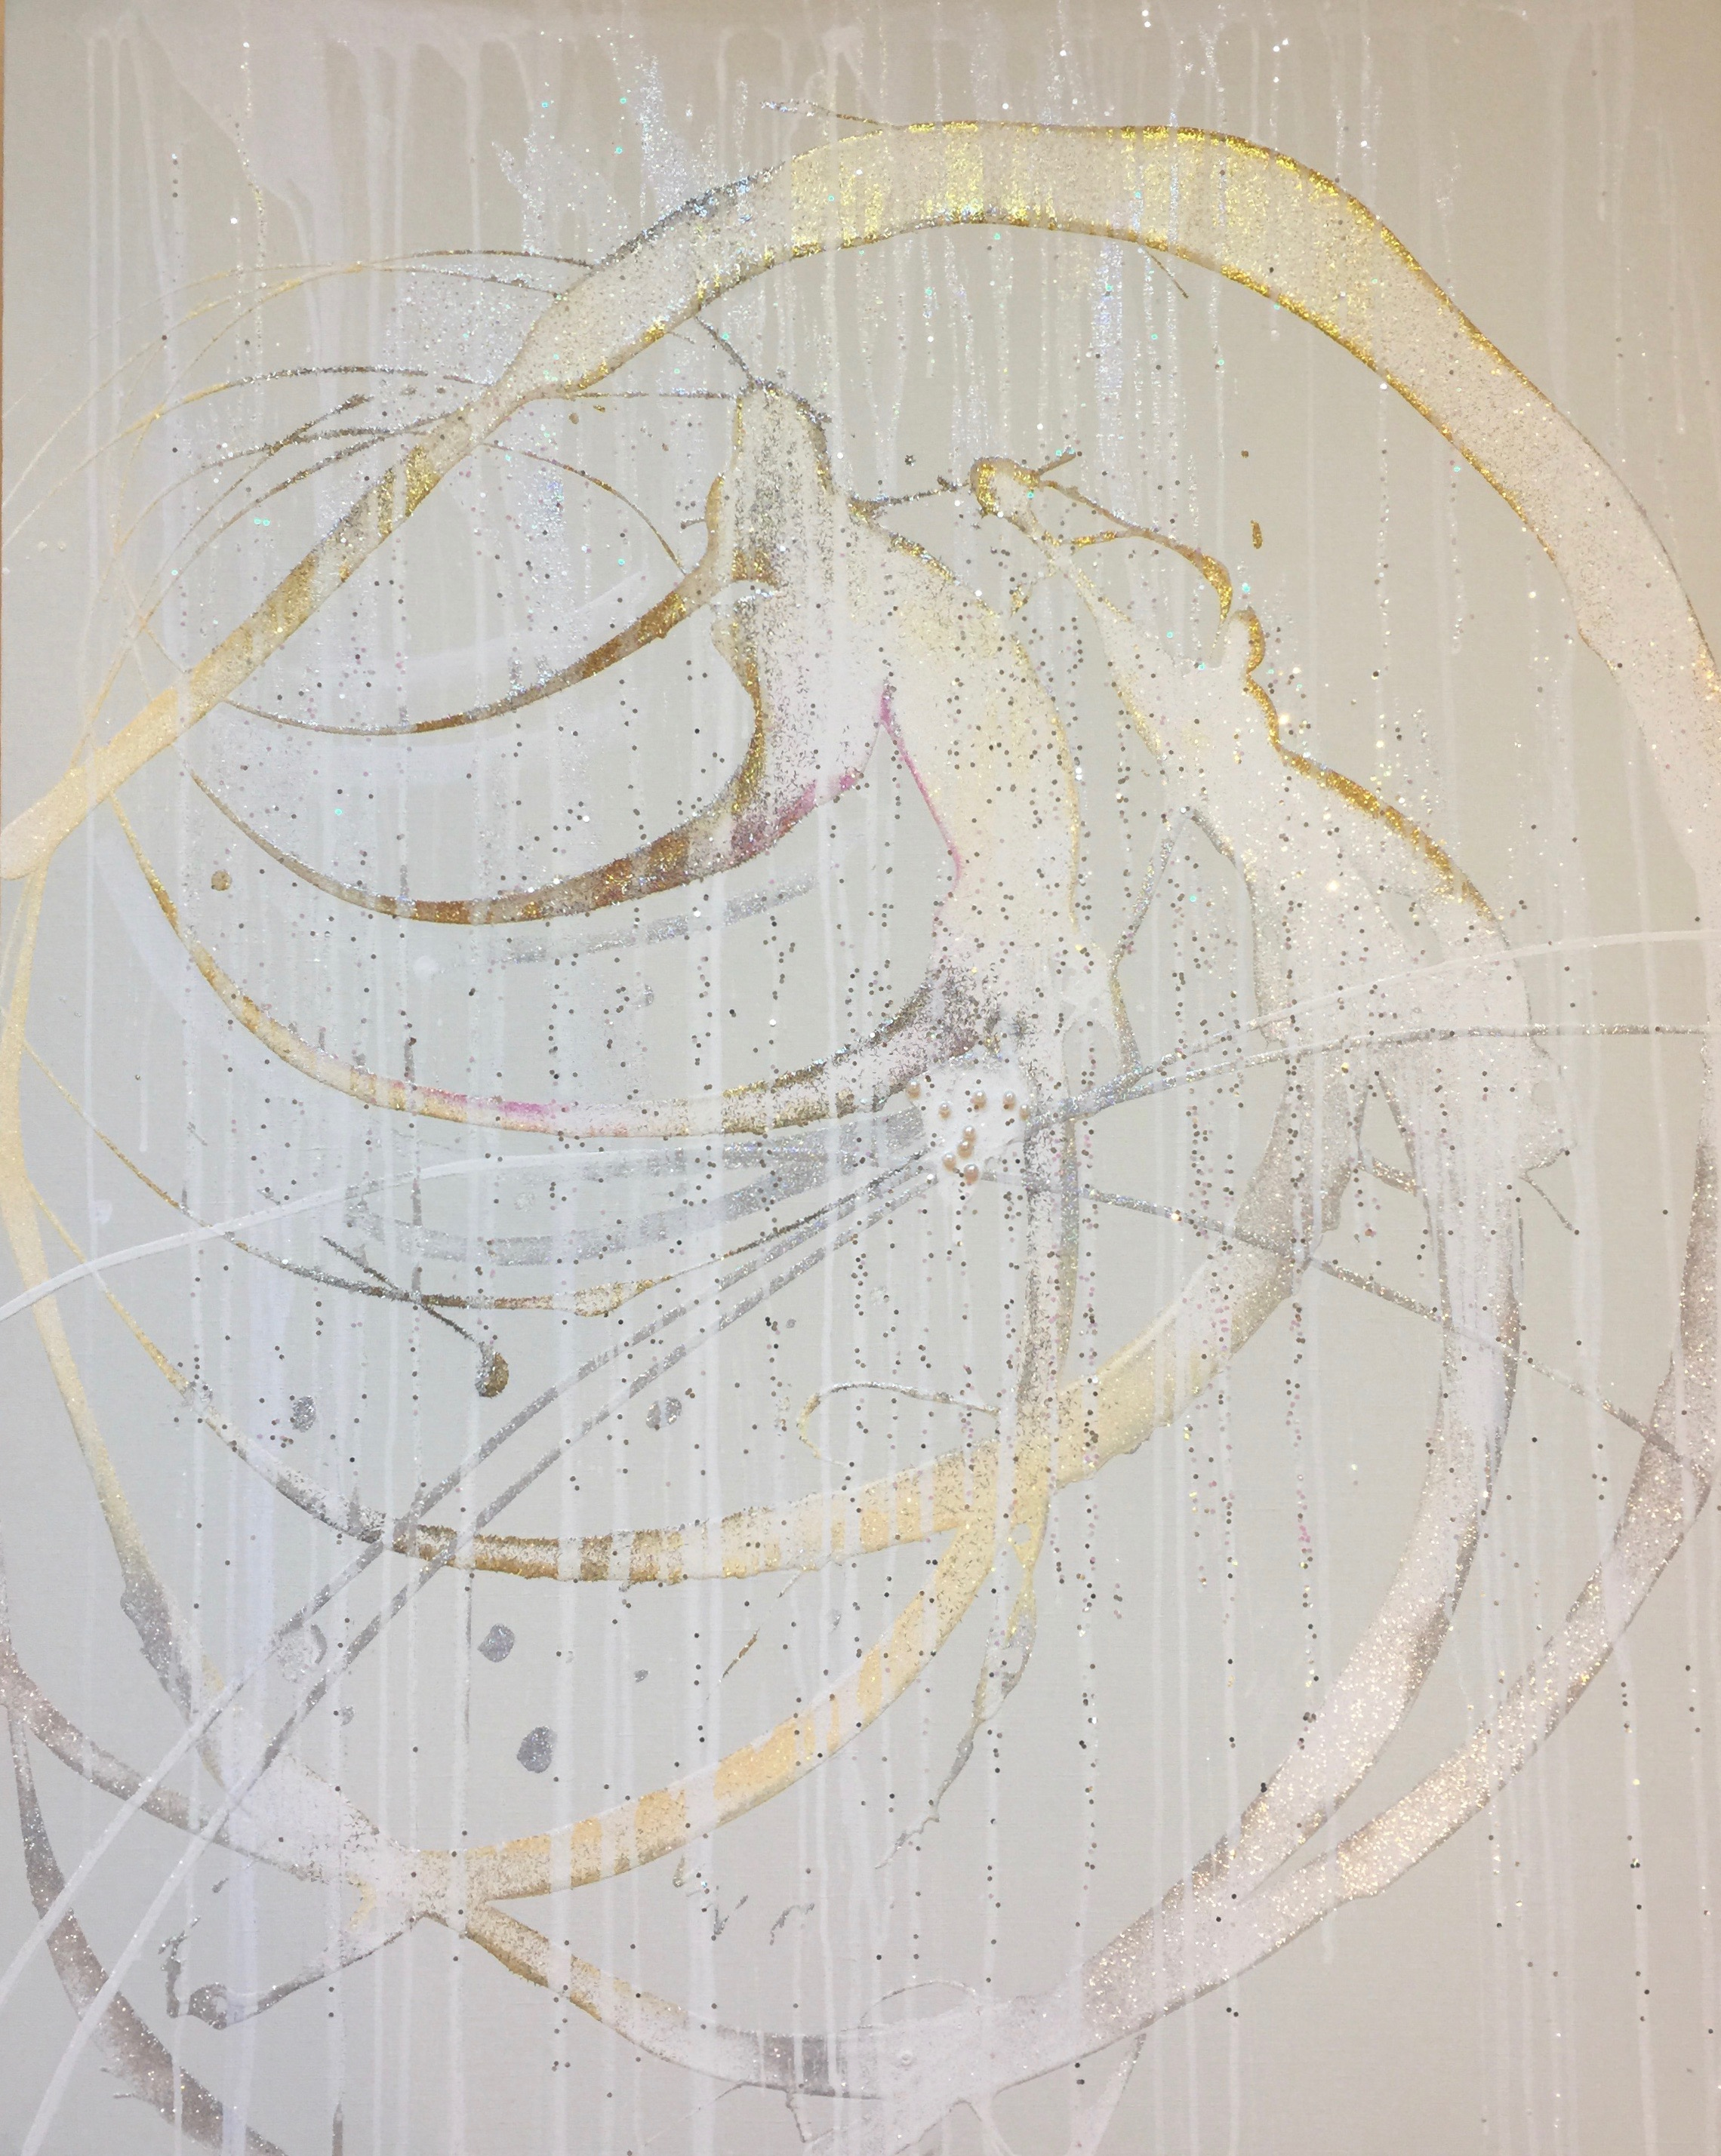 Untitled (100 x 80cm)